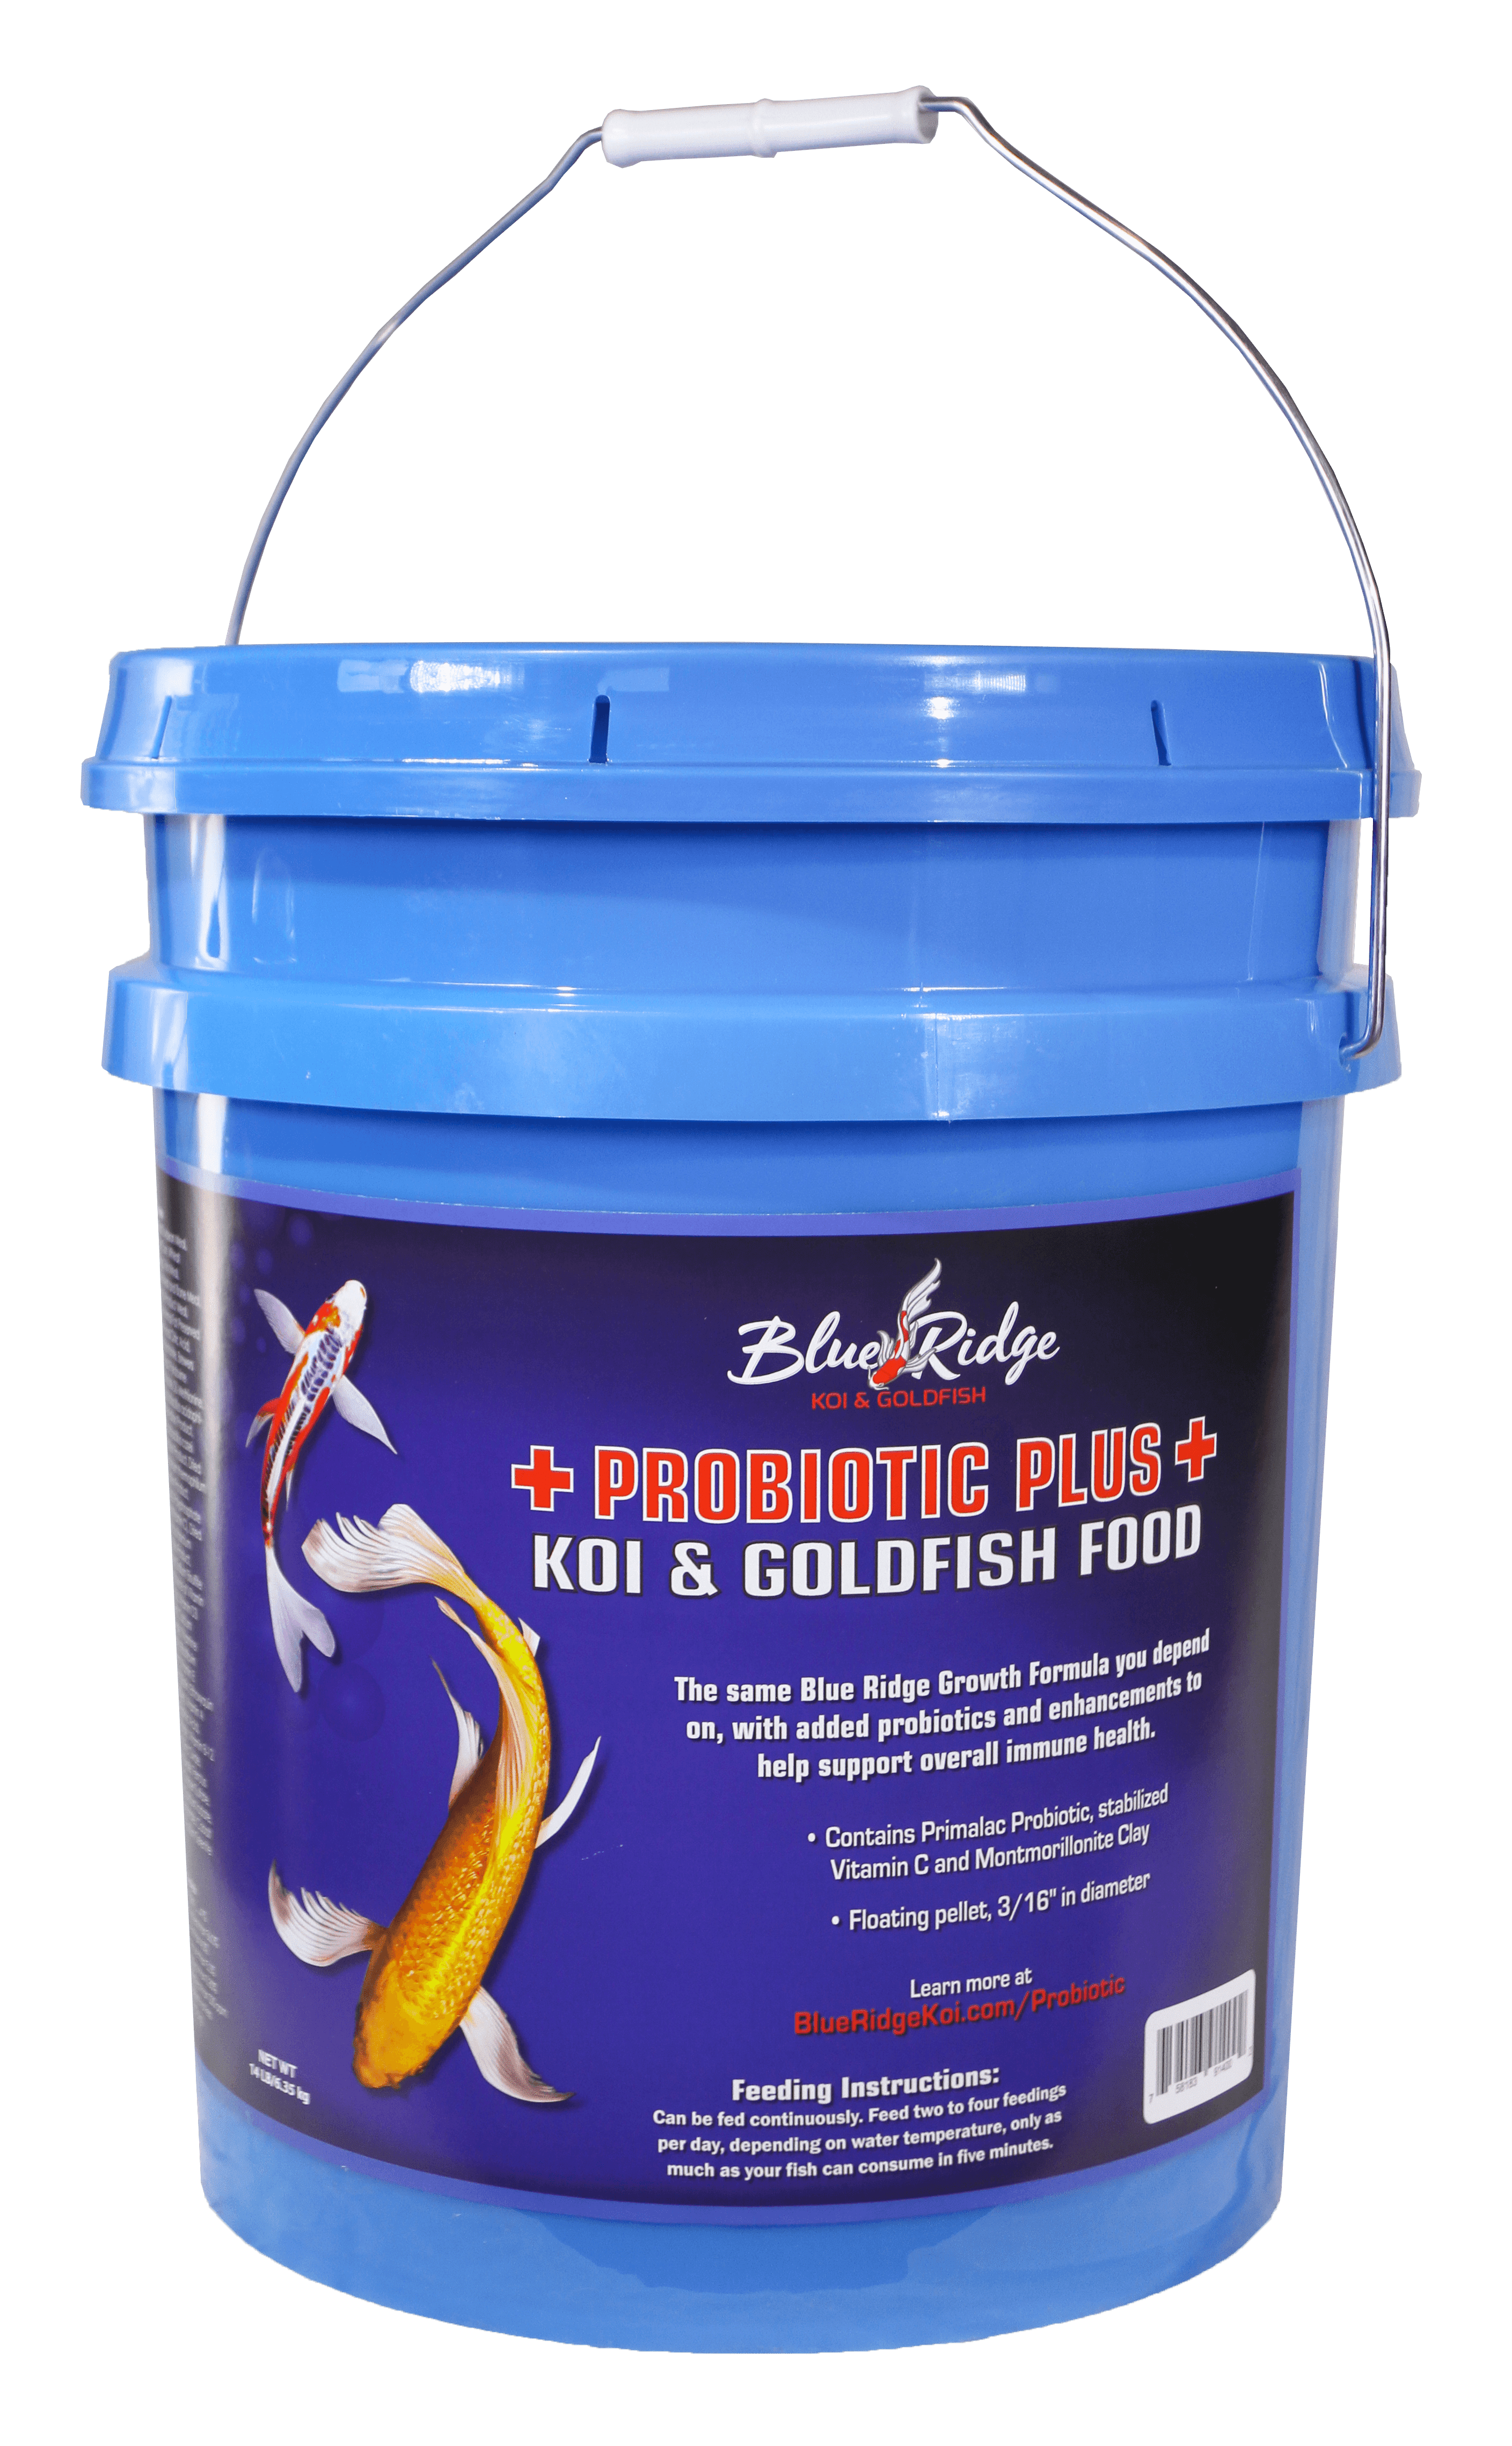 Blue Ridge Probiotic Plus Koi & Goldfish Food Fish Food Pellets, 14 lb by Blue Ridge Koi & Goldfish